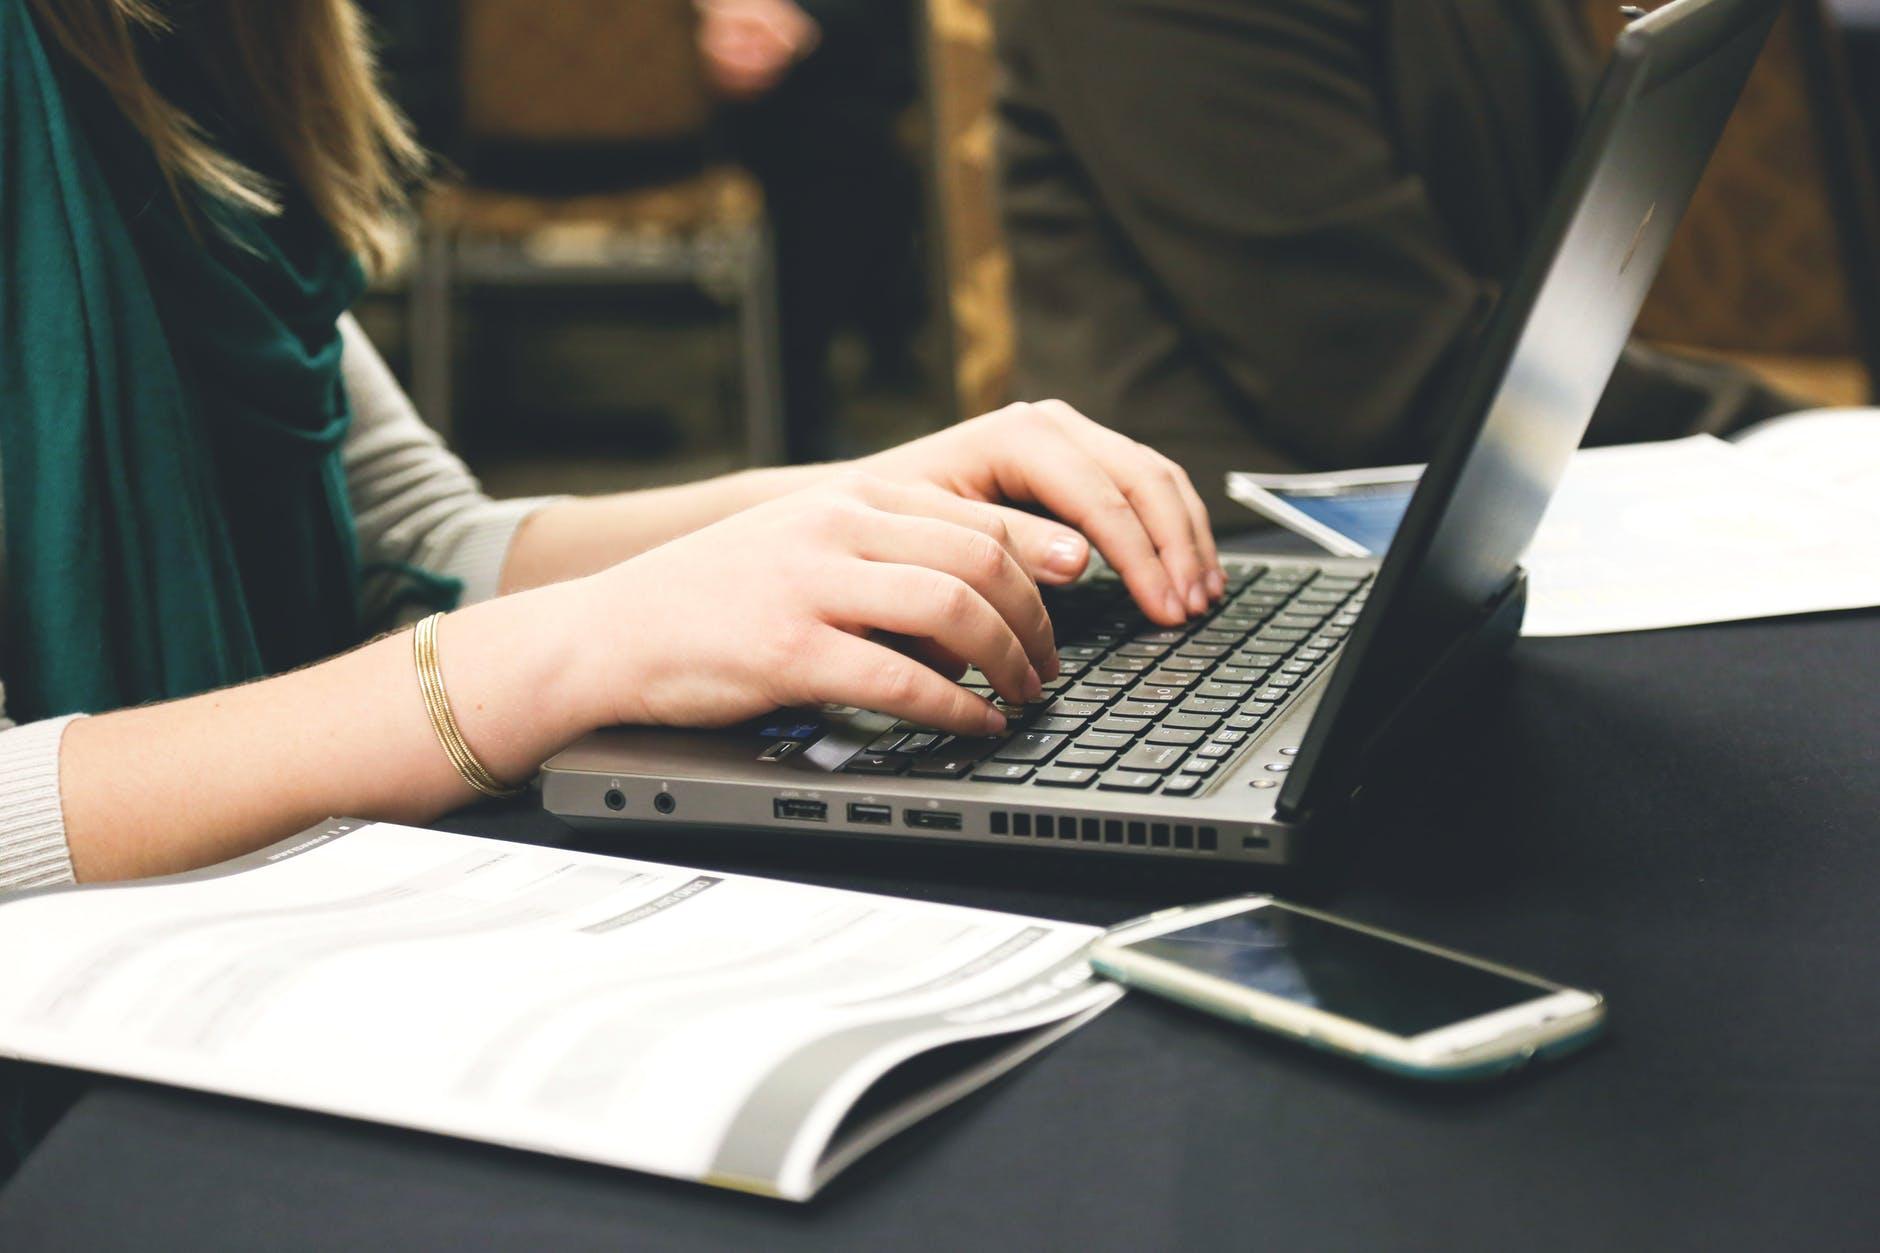 woman-typing-writing